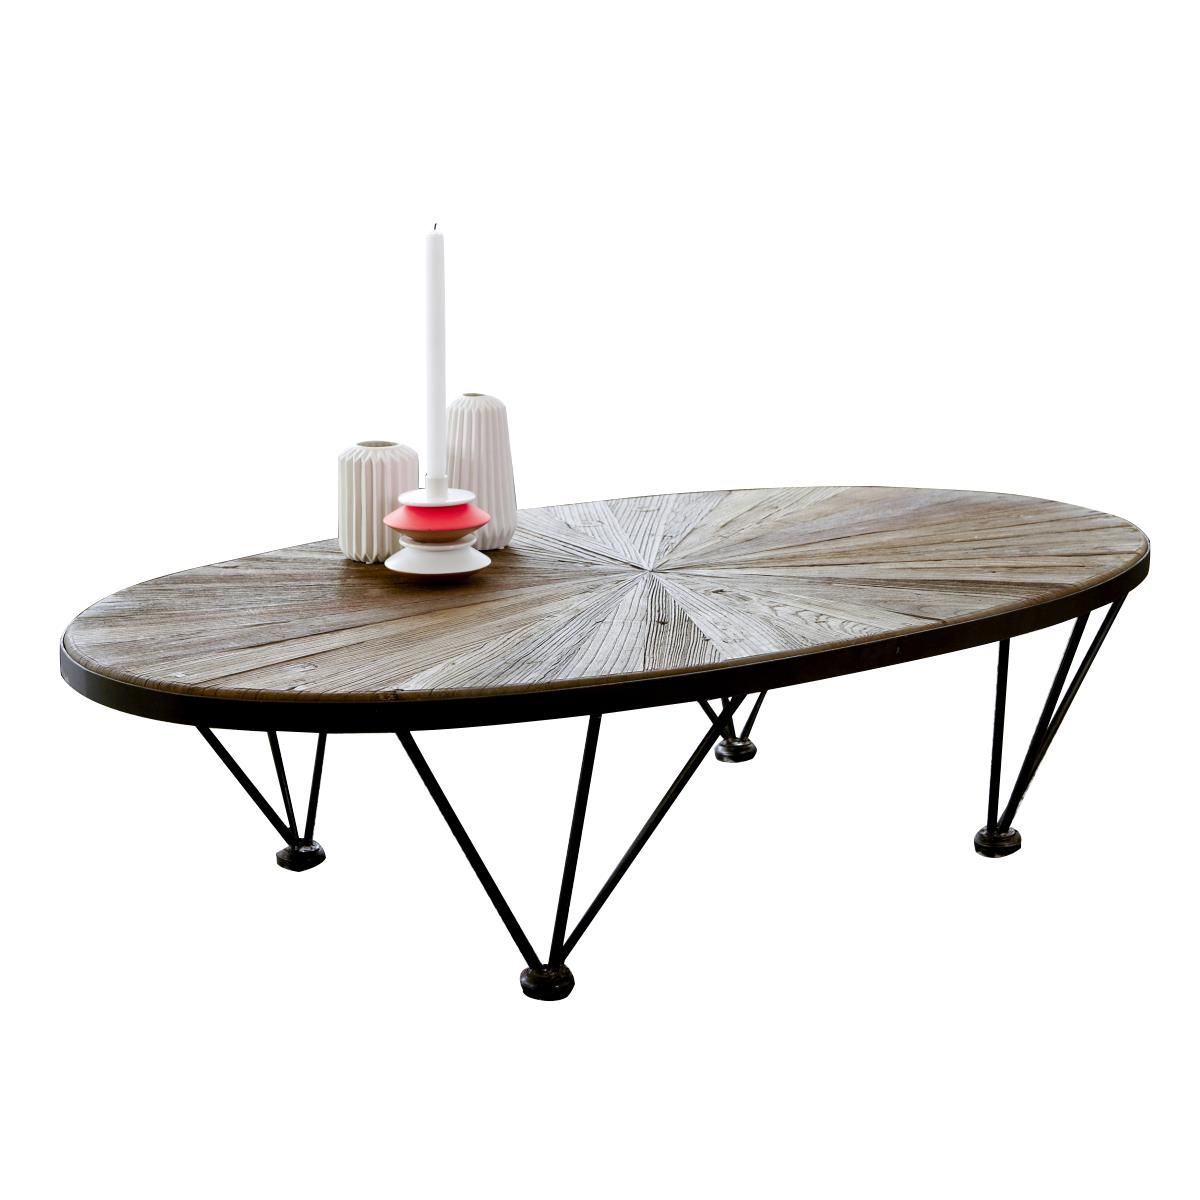 Basse En Métal 140x80 Table LancelotHome Et Orme vg76Ybfy